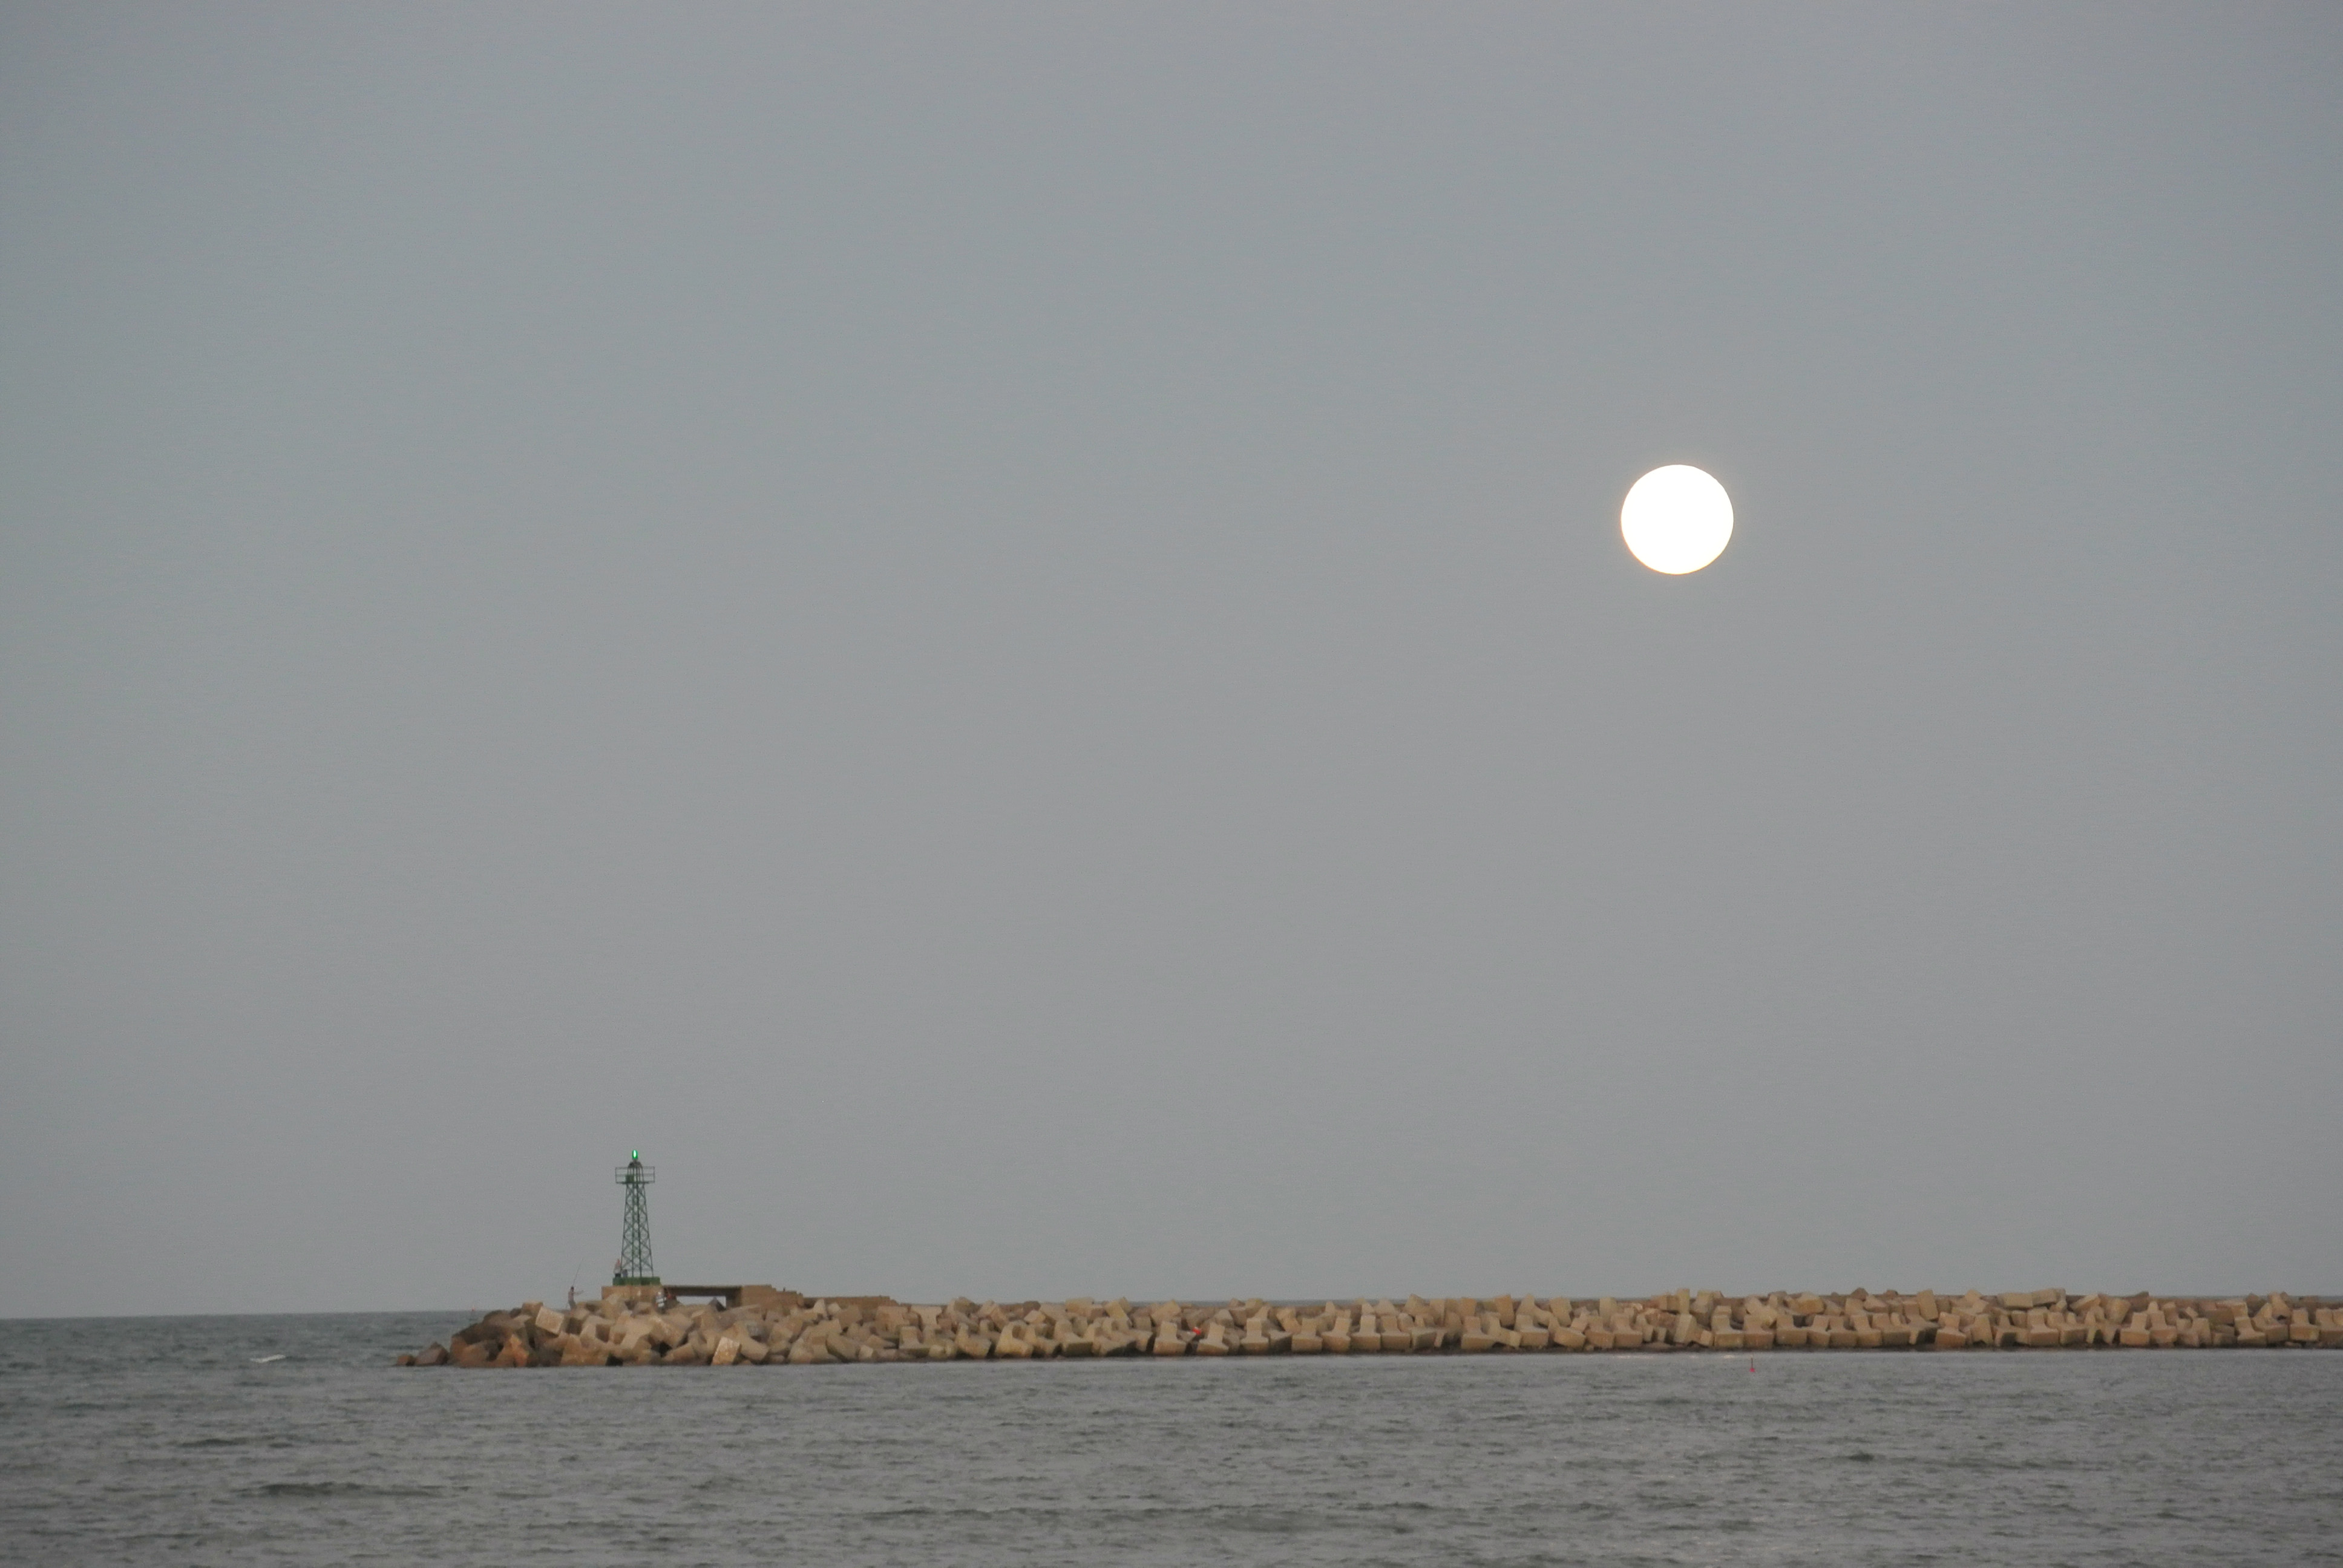 010 3003 Leuchtturm La Paloma 11JPG